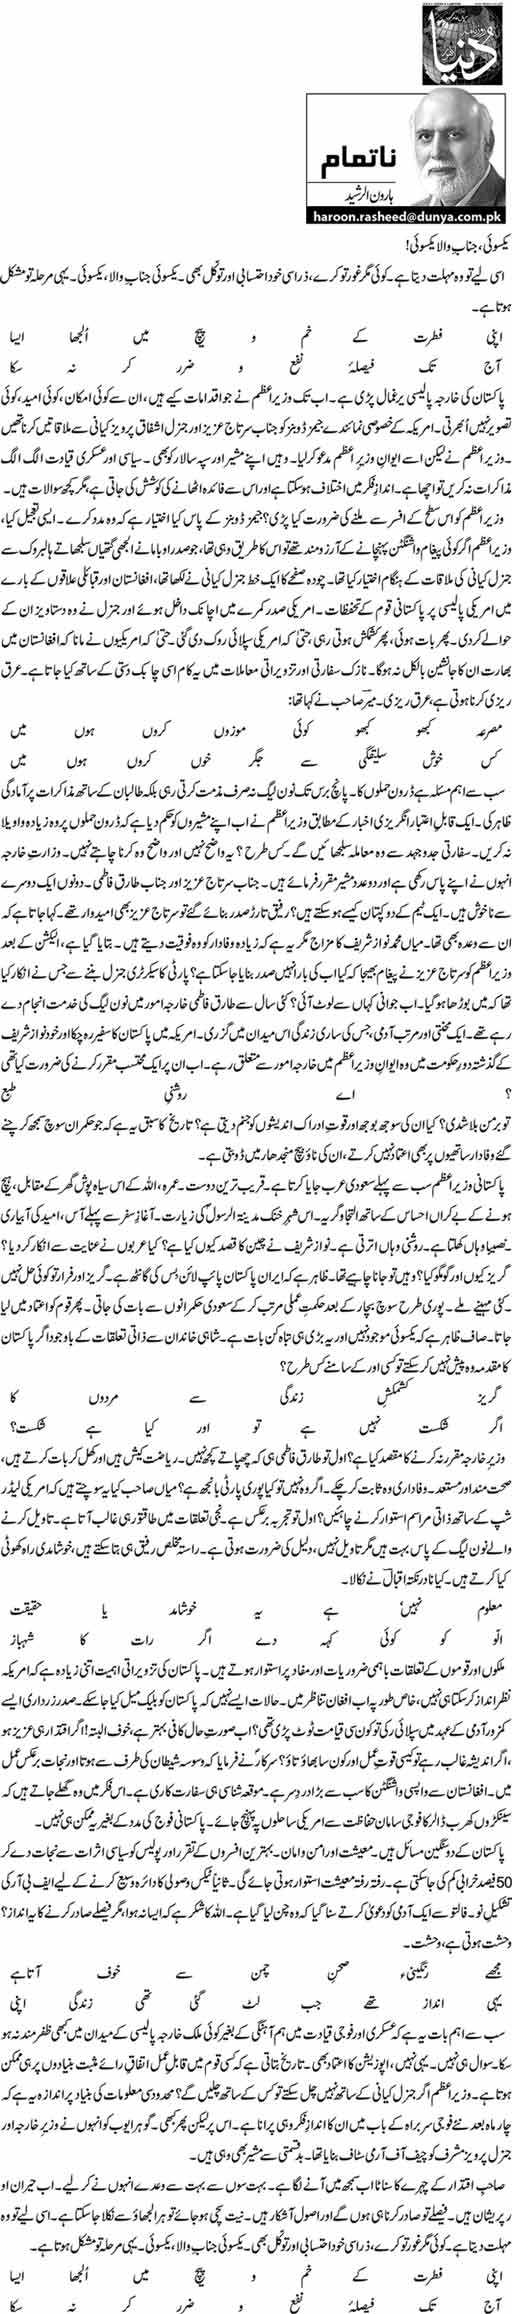 Yaksoi, Janab e Wala Yaksoi! - Haroon-ur-Rasheed